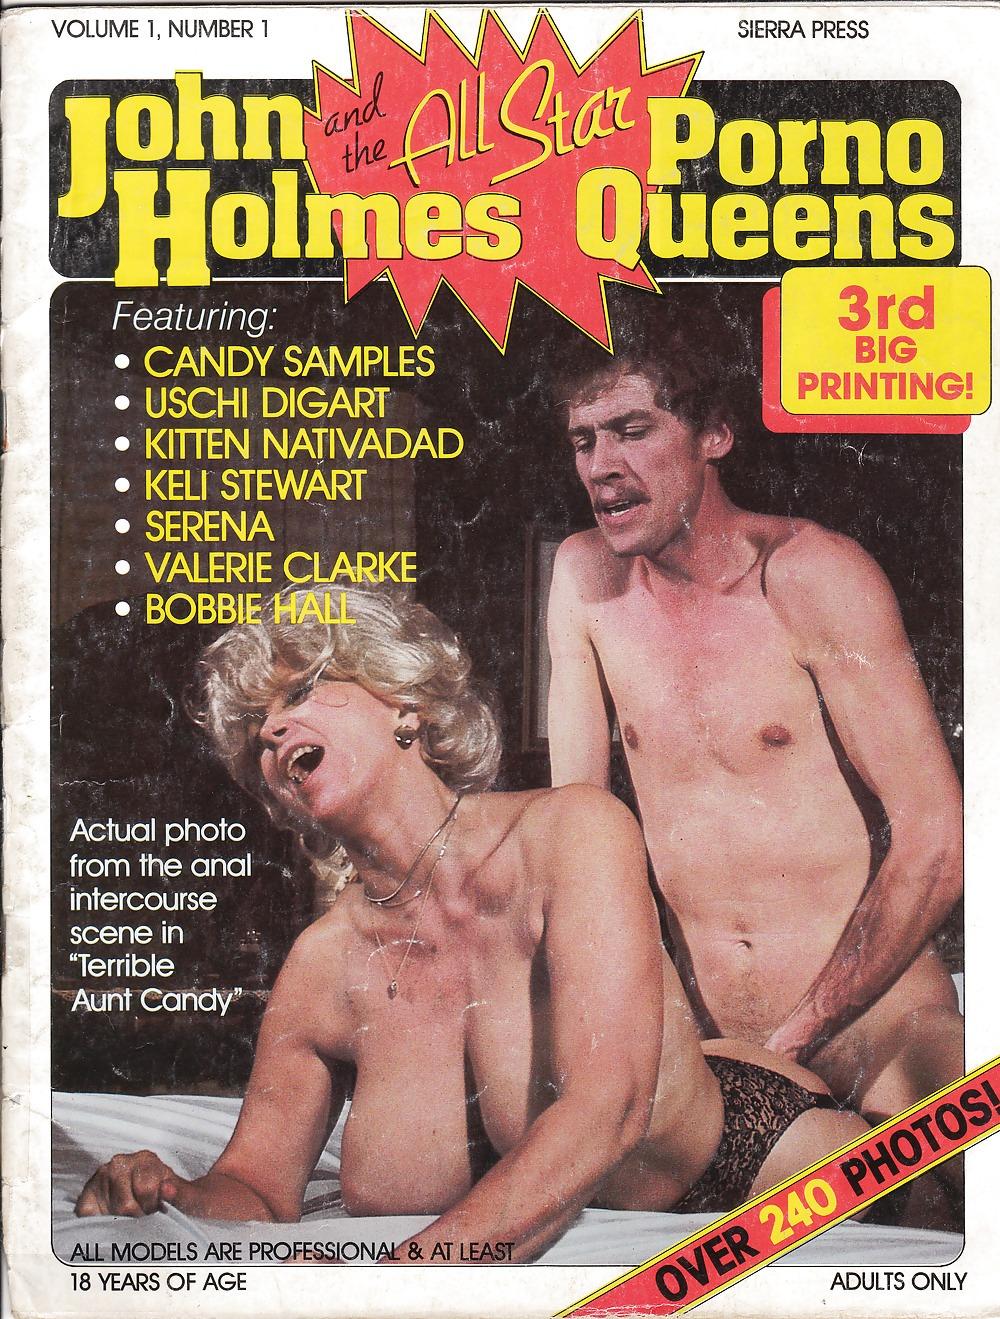 That holmes pornostar porno star john c holmes share your